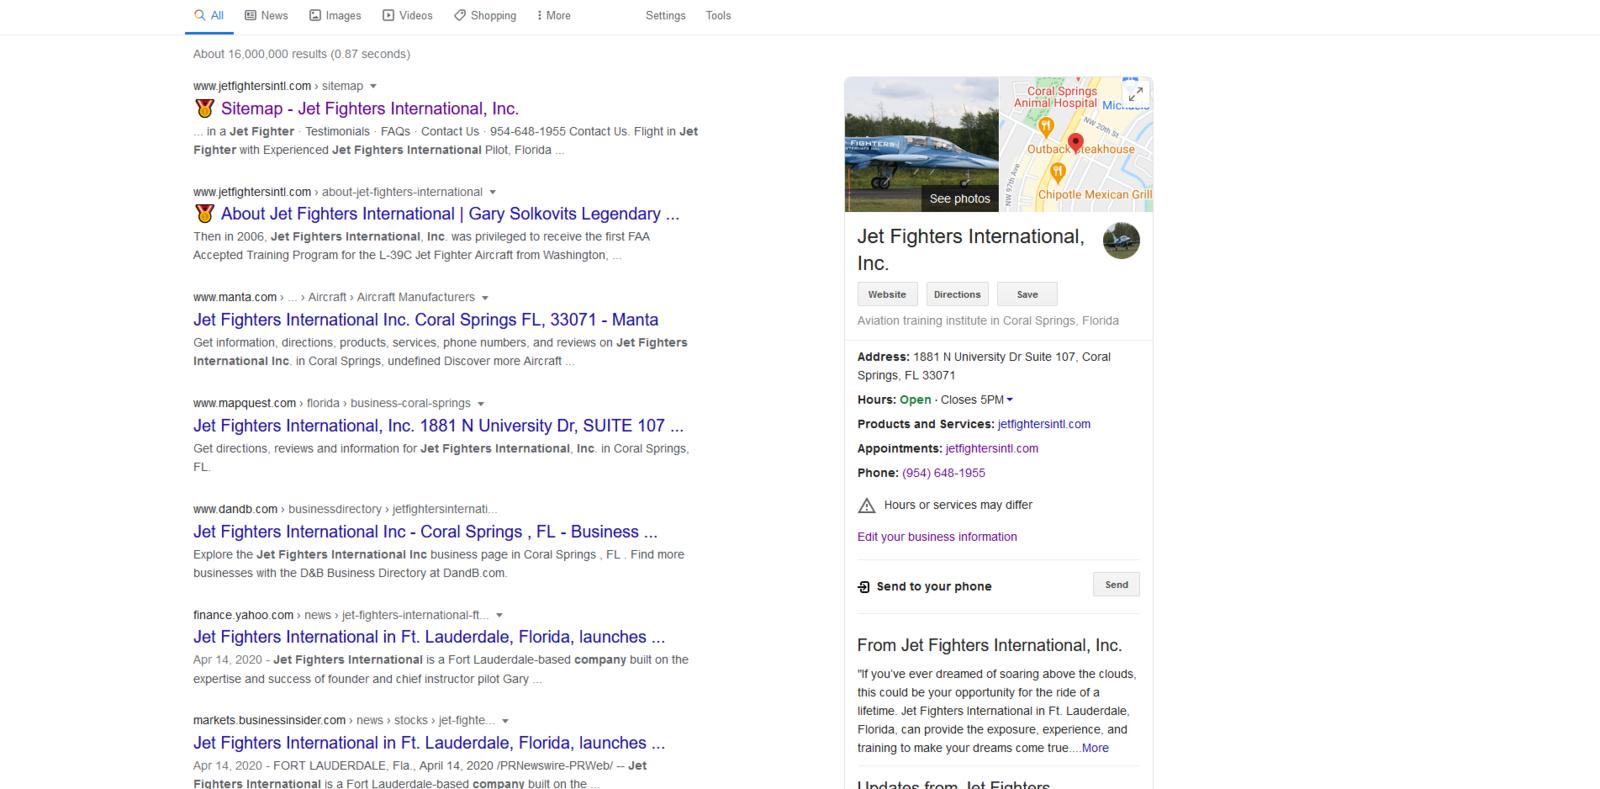 Screenshot_2020-10-01 Jet Fighters International, Inc - Google Search.png